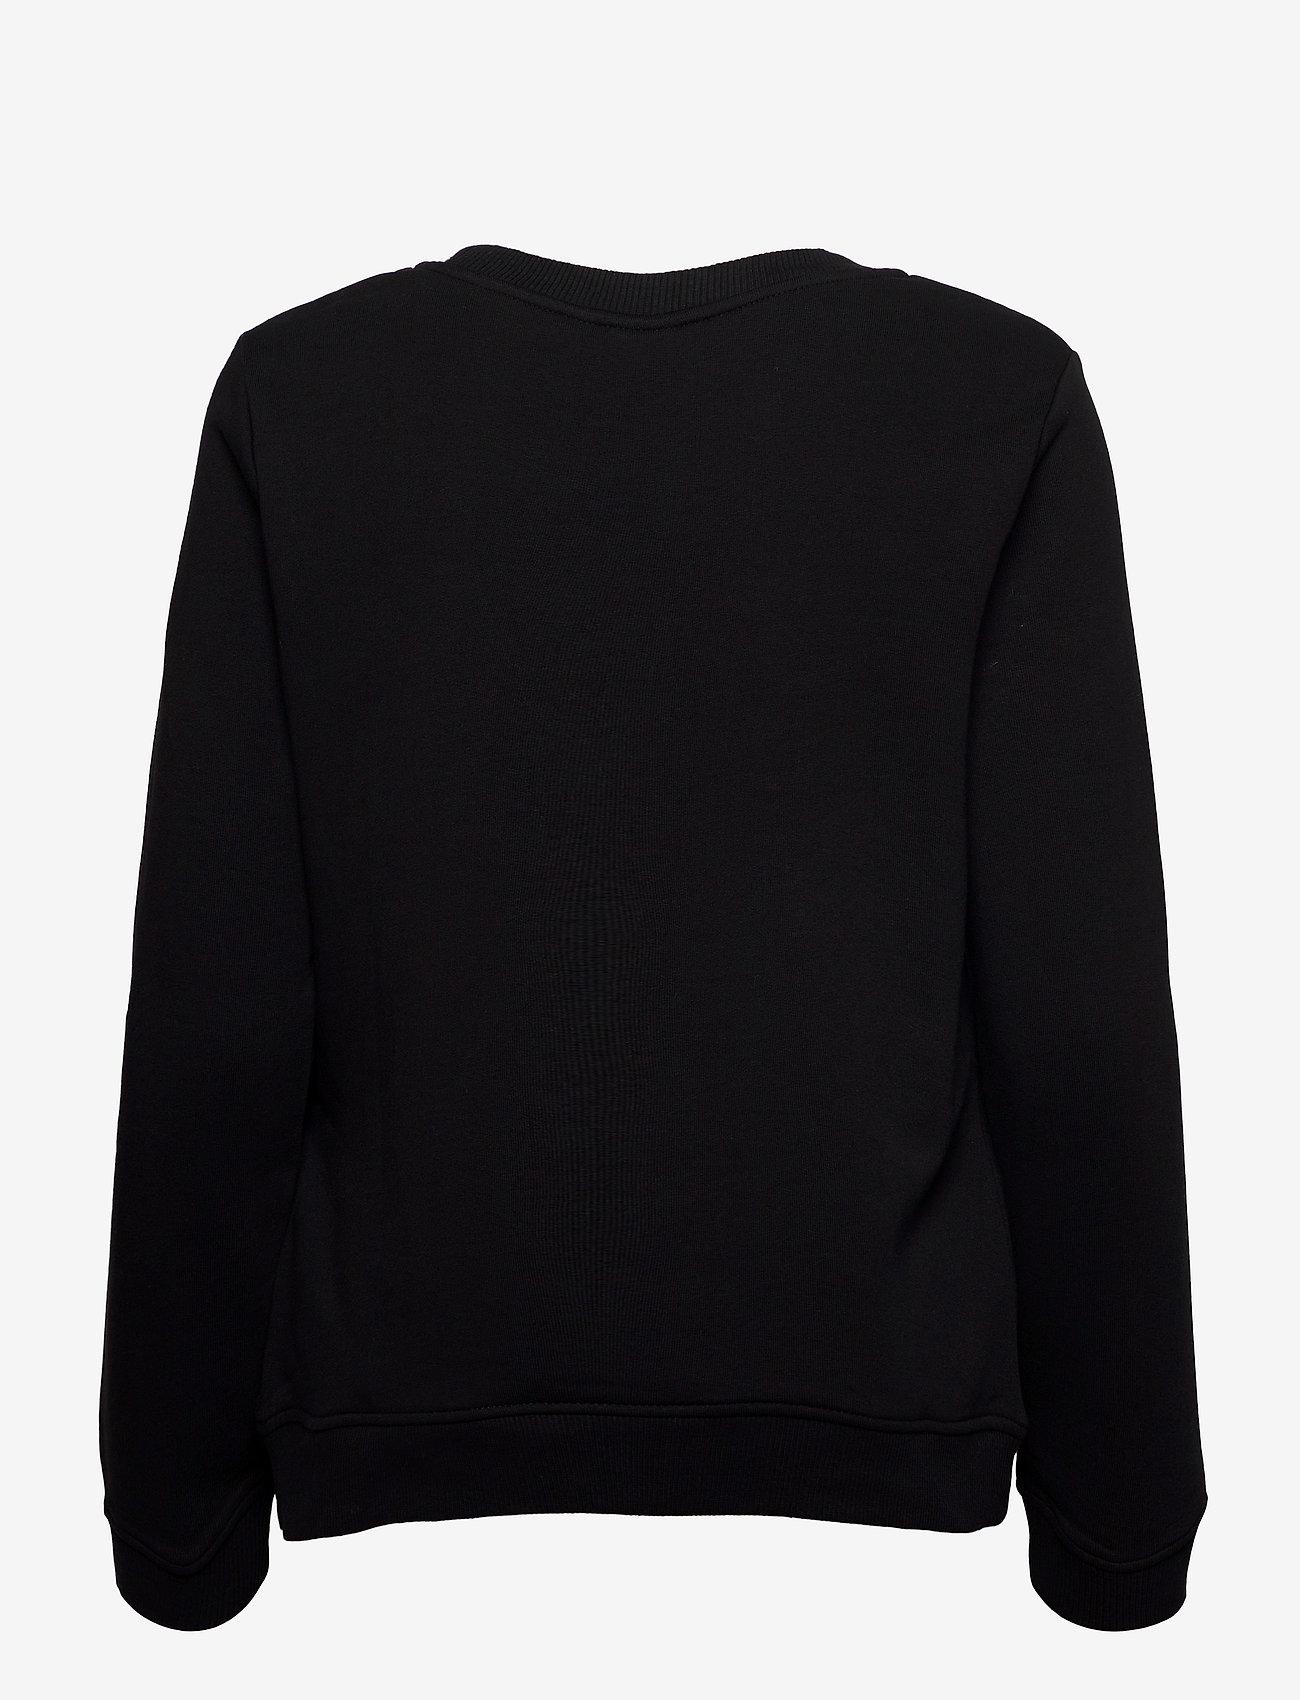 VANS - CLASSIC V CREW - sweatshirts - black - 1